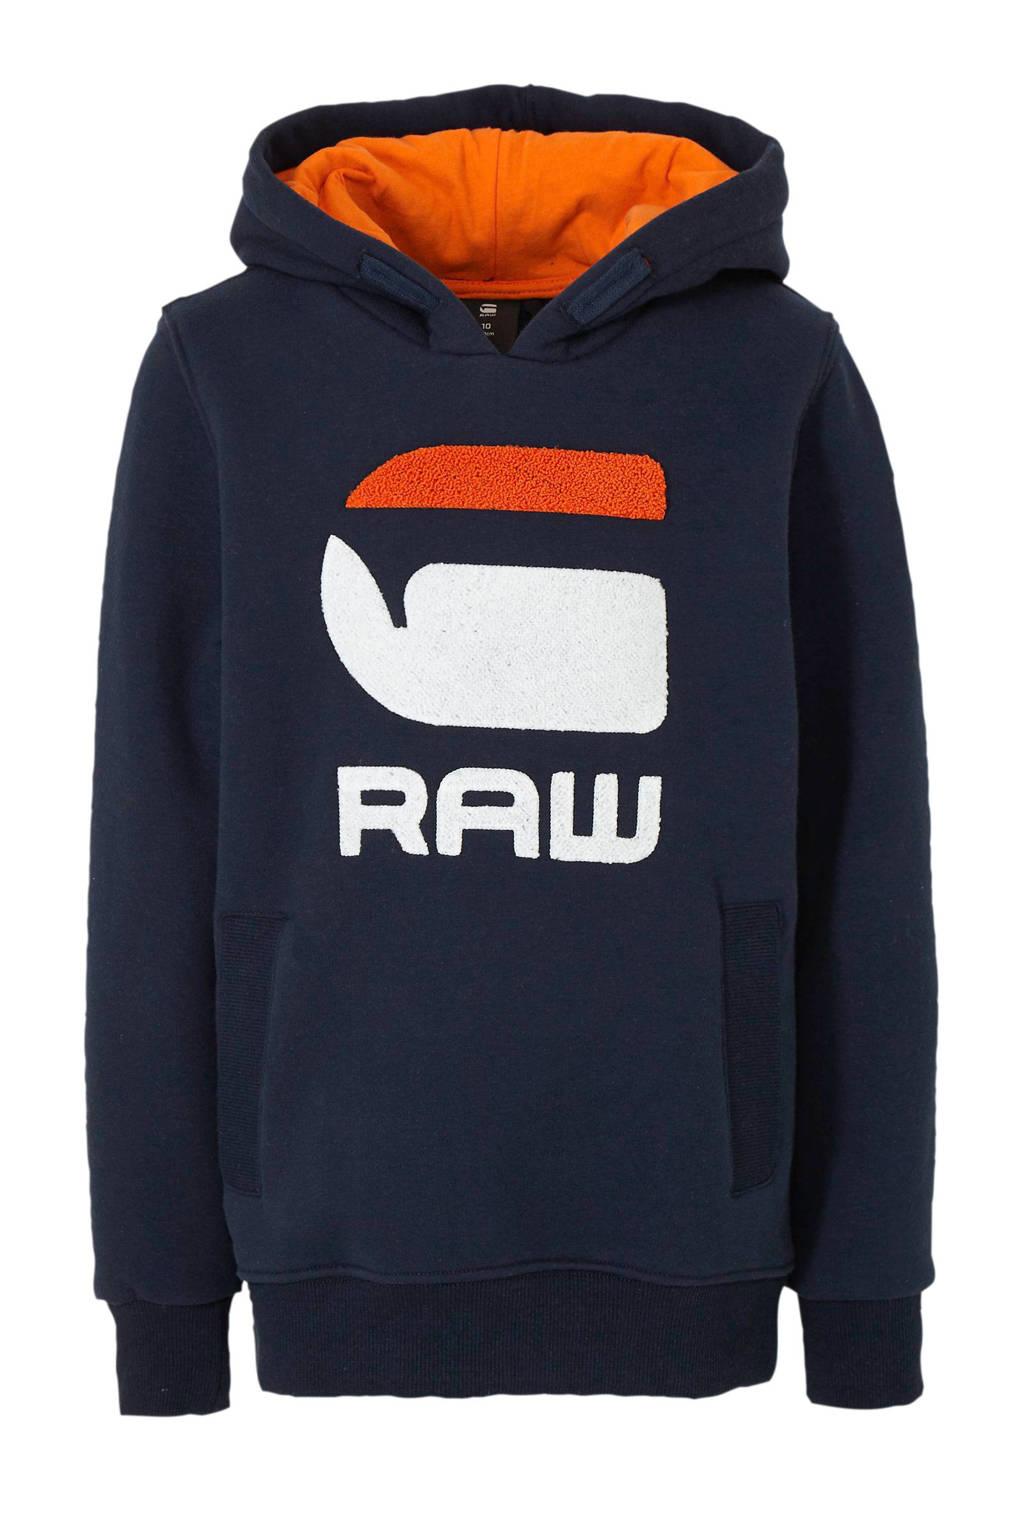 G-Star RAW hoodie met logo en 3D applicatie marine/oranje/wit, Marine/oranje/wit